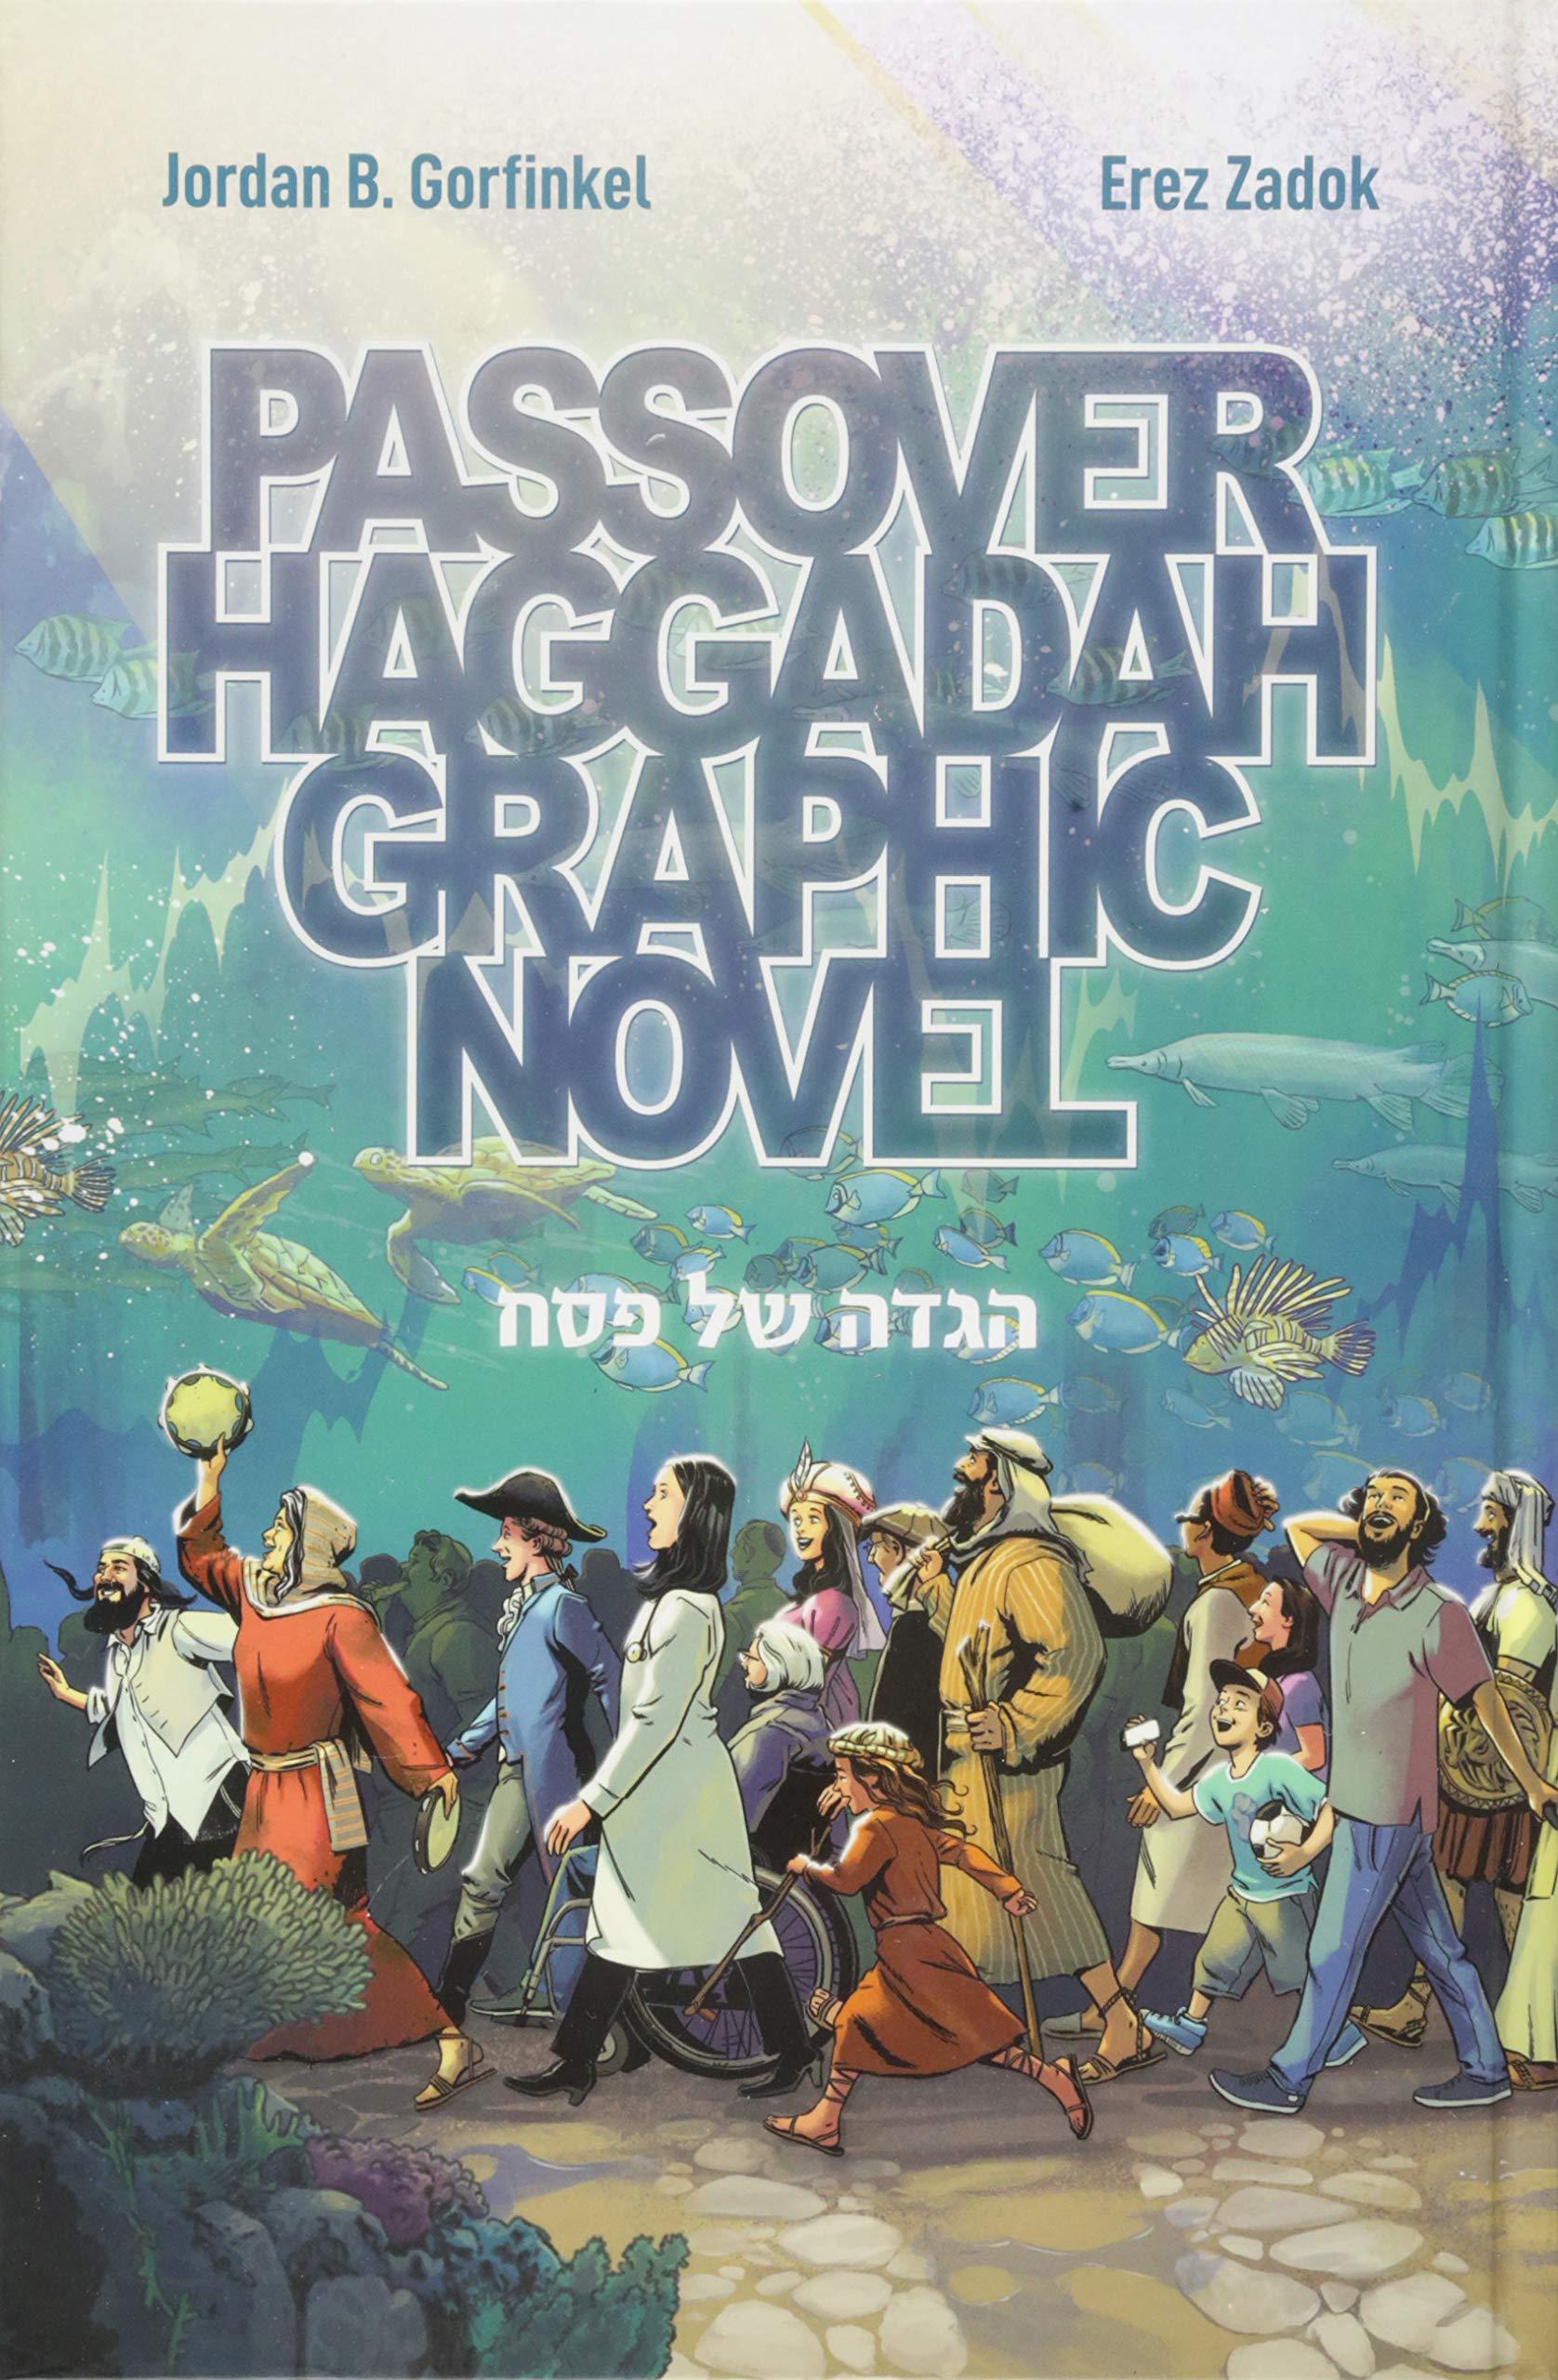 Best Comics of 2019: Passover Haggadah Graphic Novel